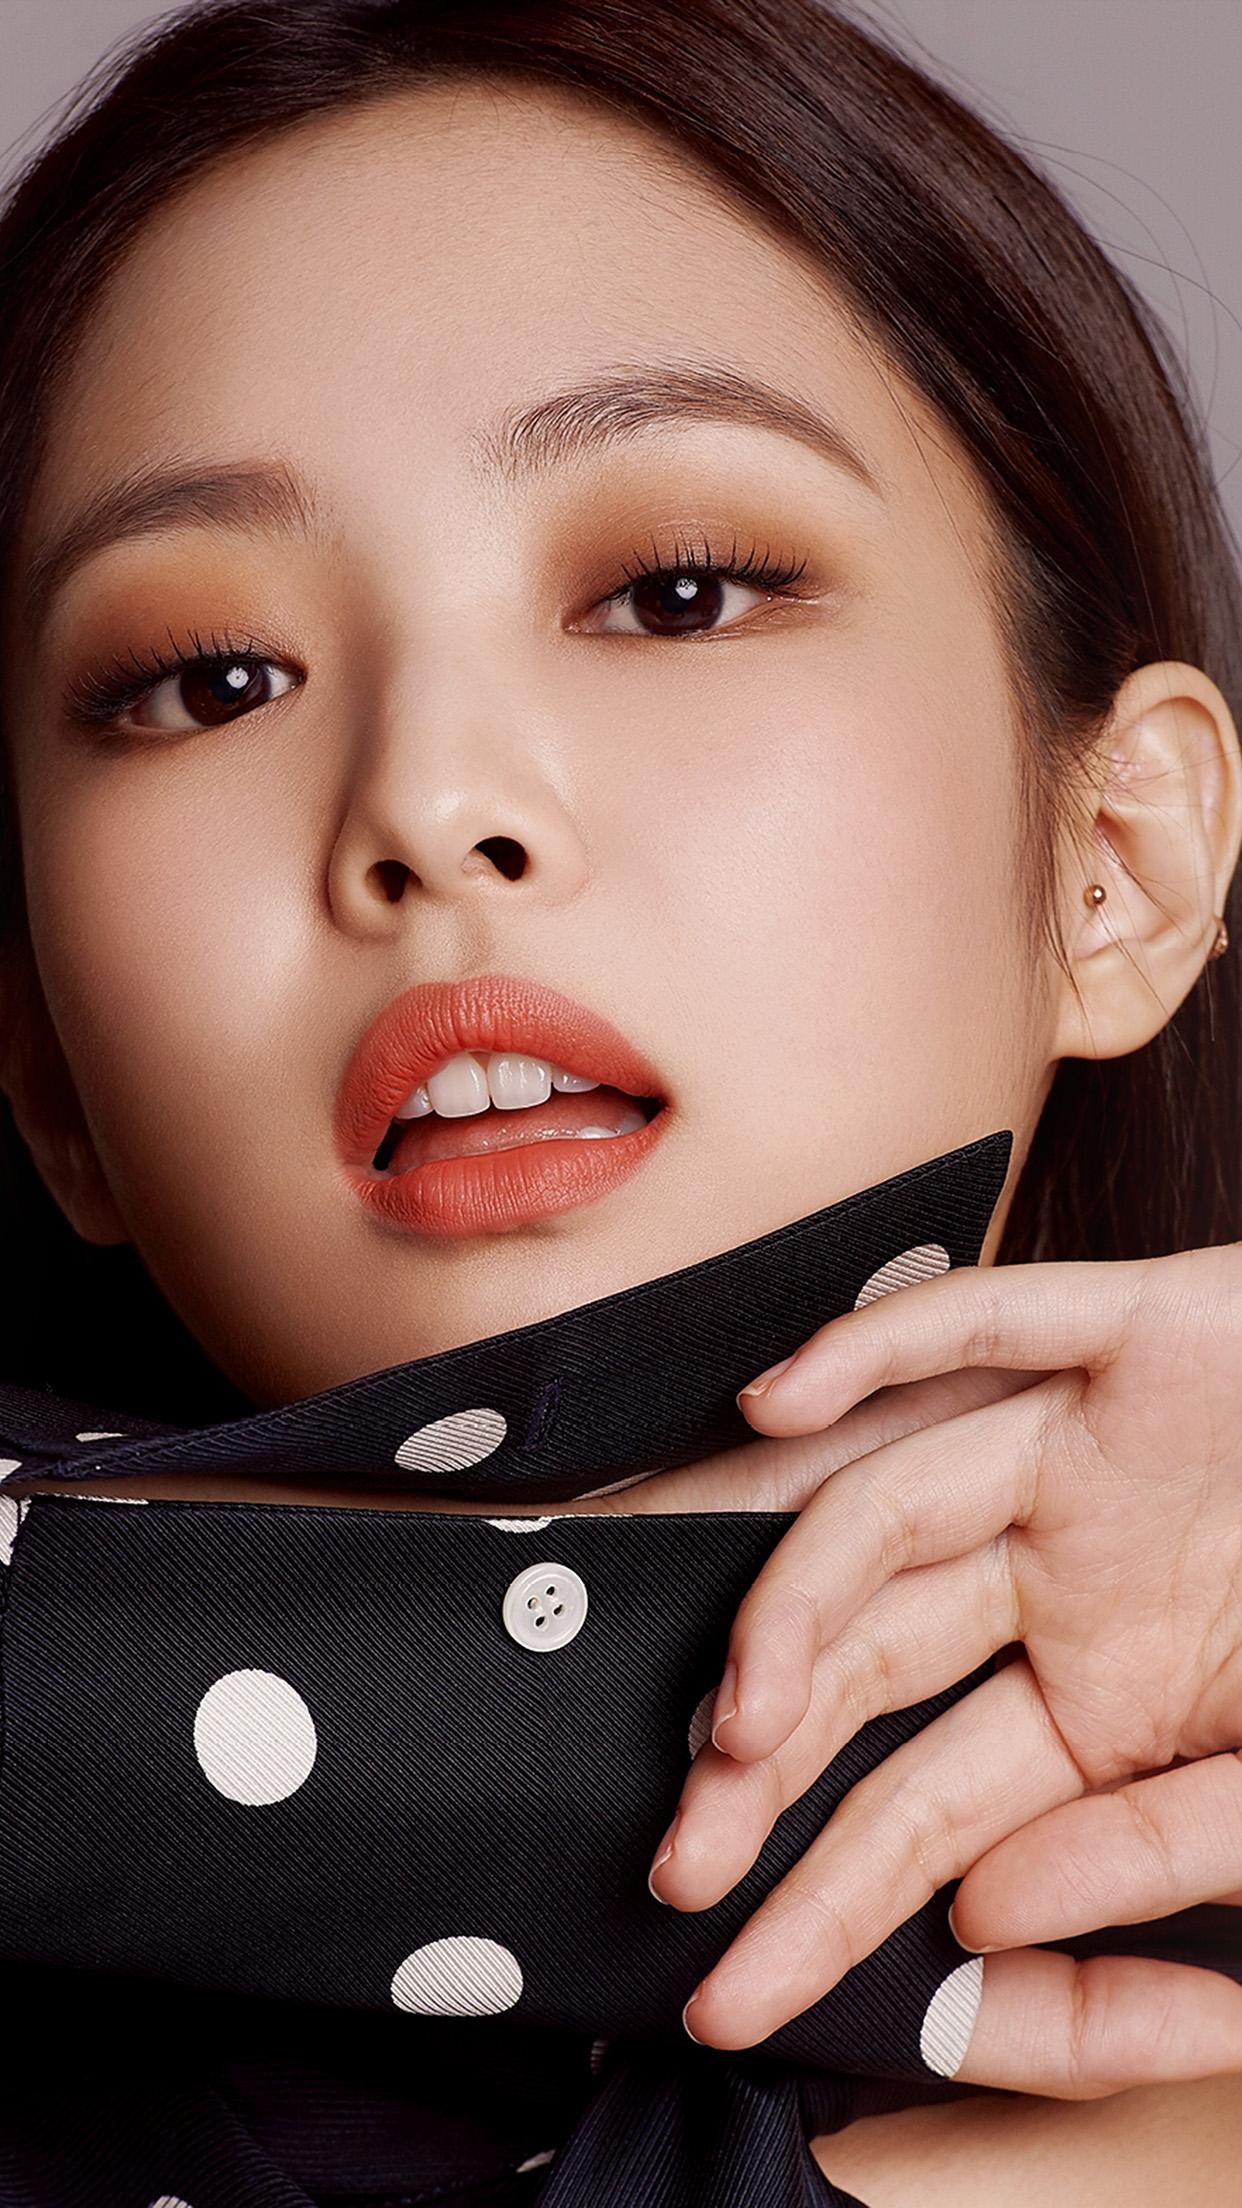 Hs01 Kpop Girl Jennie Channel Blackpink